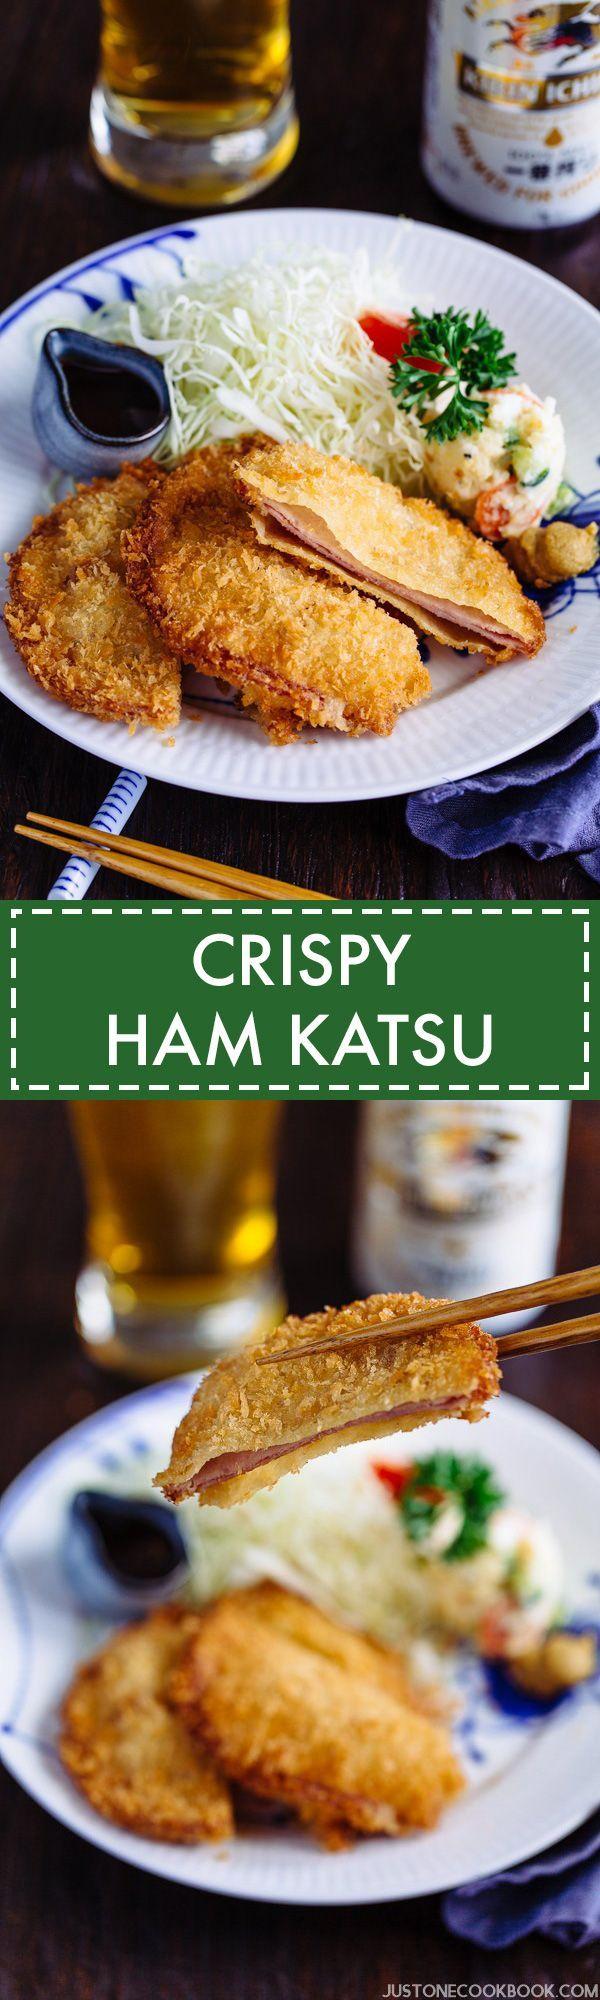 Best 25 easy japanese recipes ideas on pinterest japanese ham katsu easy japanese recipeskorean food forumfinder Gallery